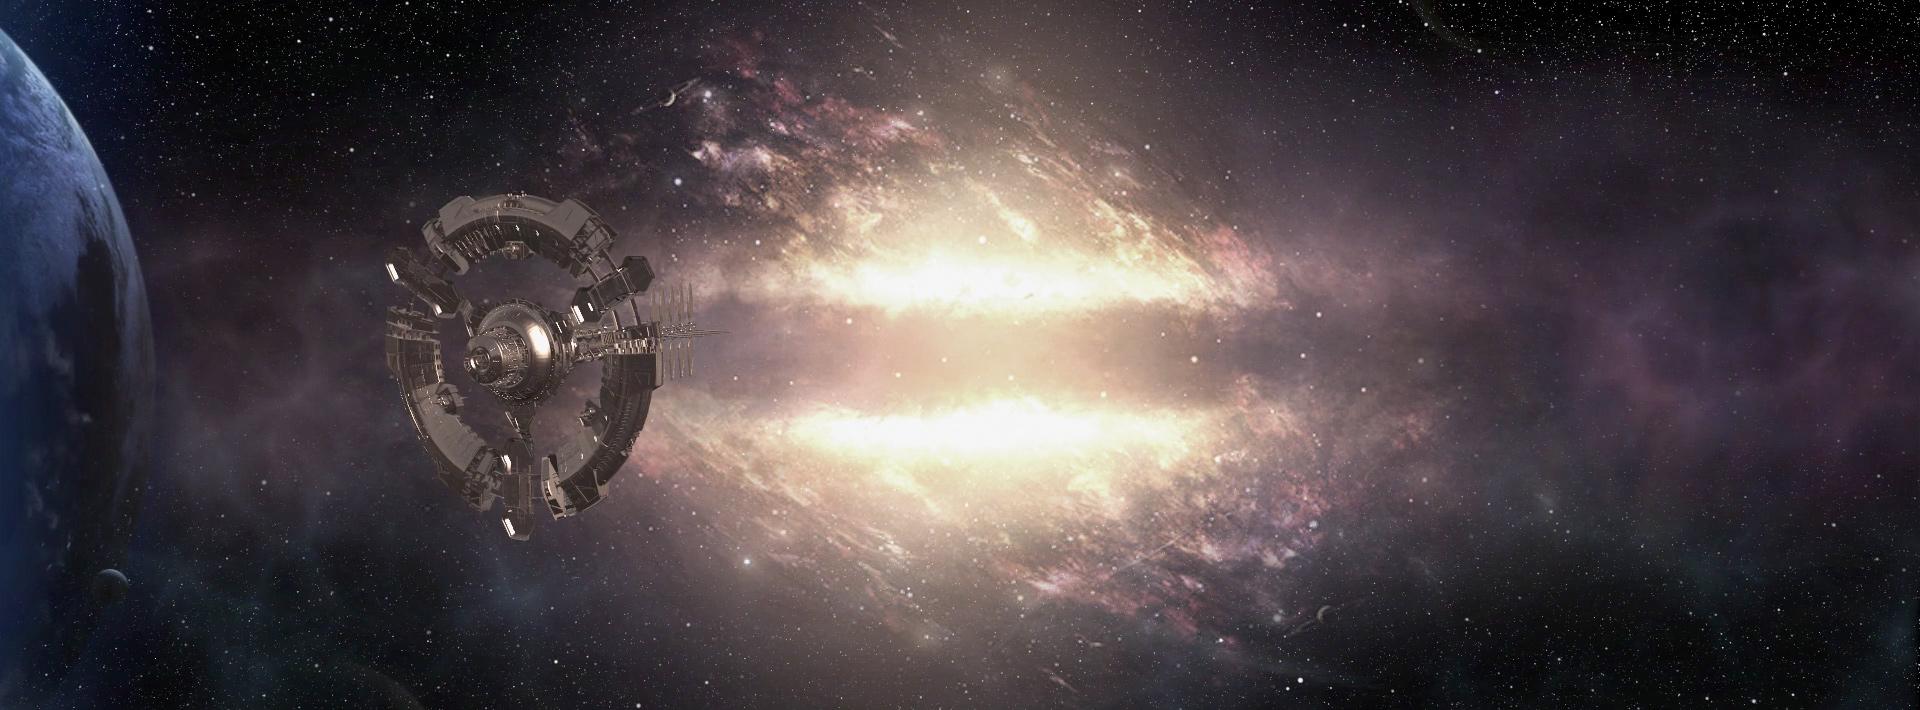 beautifully-shot-sci-fi-short-film-beyond-8.jpg